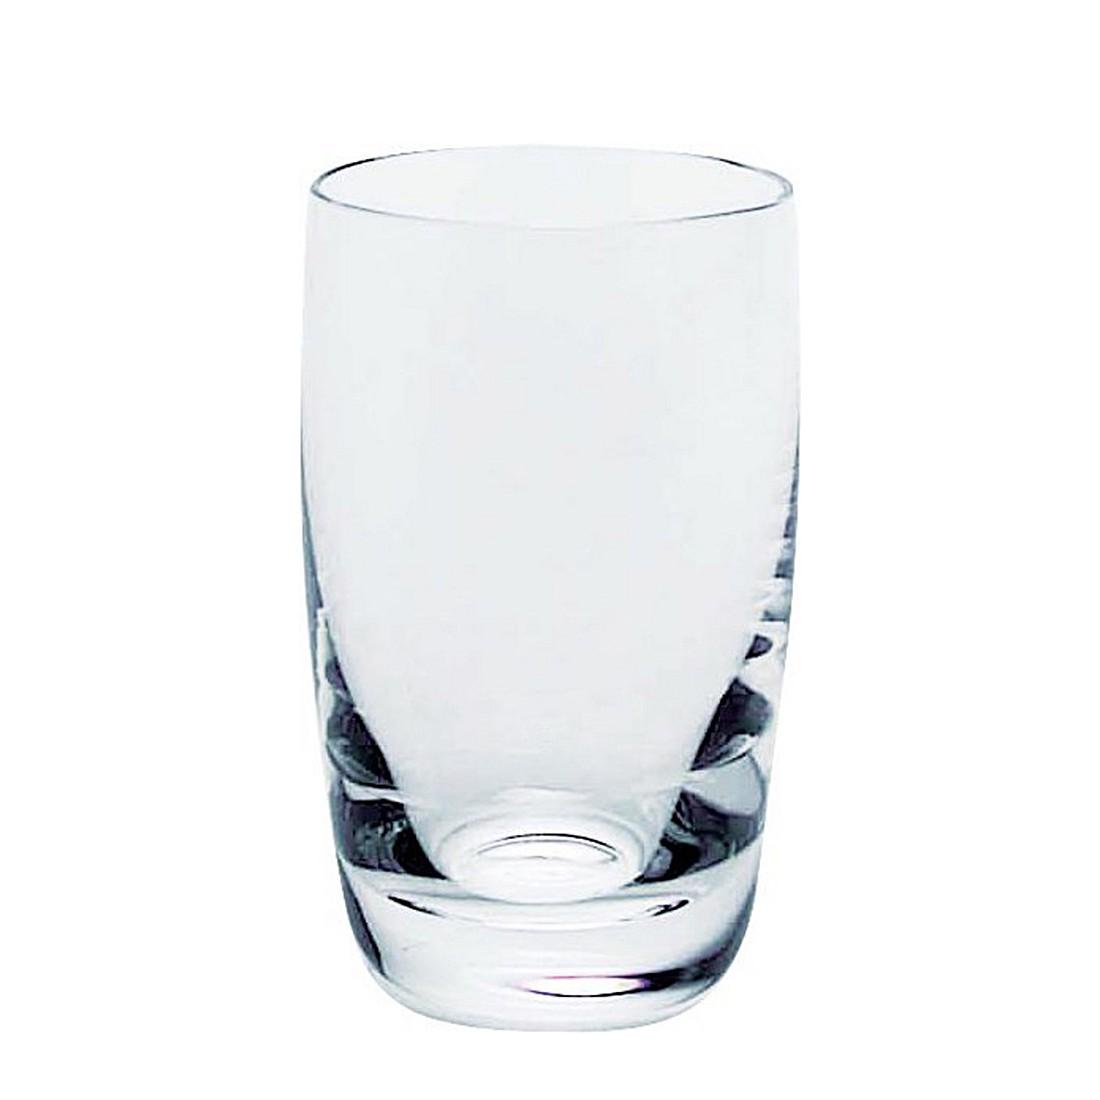 Likörglas L'Acq (6er-Set), Alessi bestellen